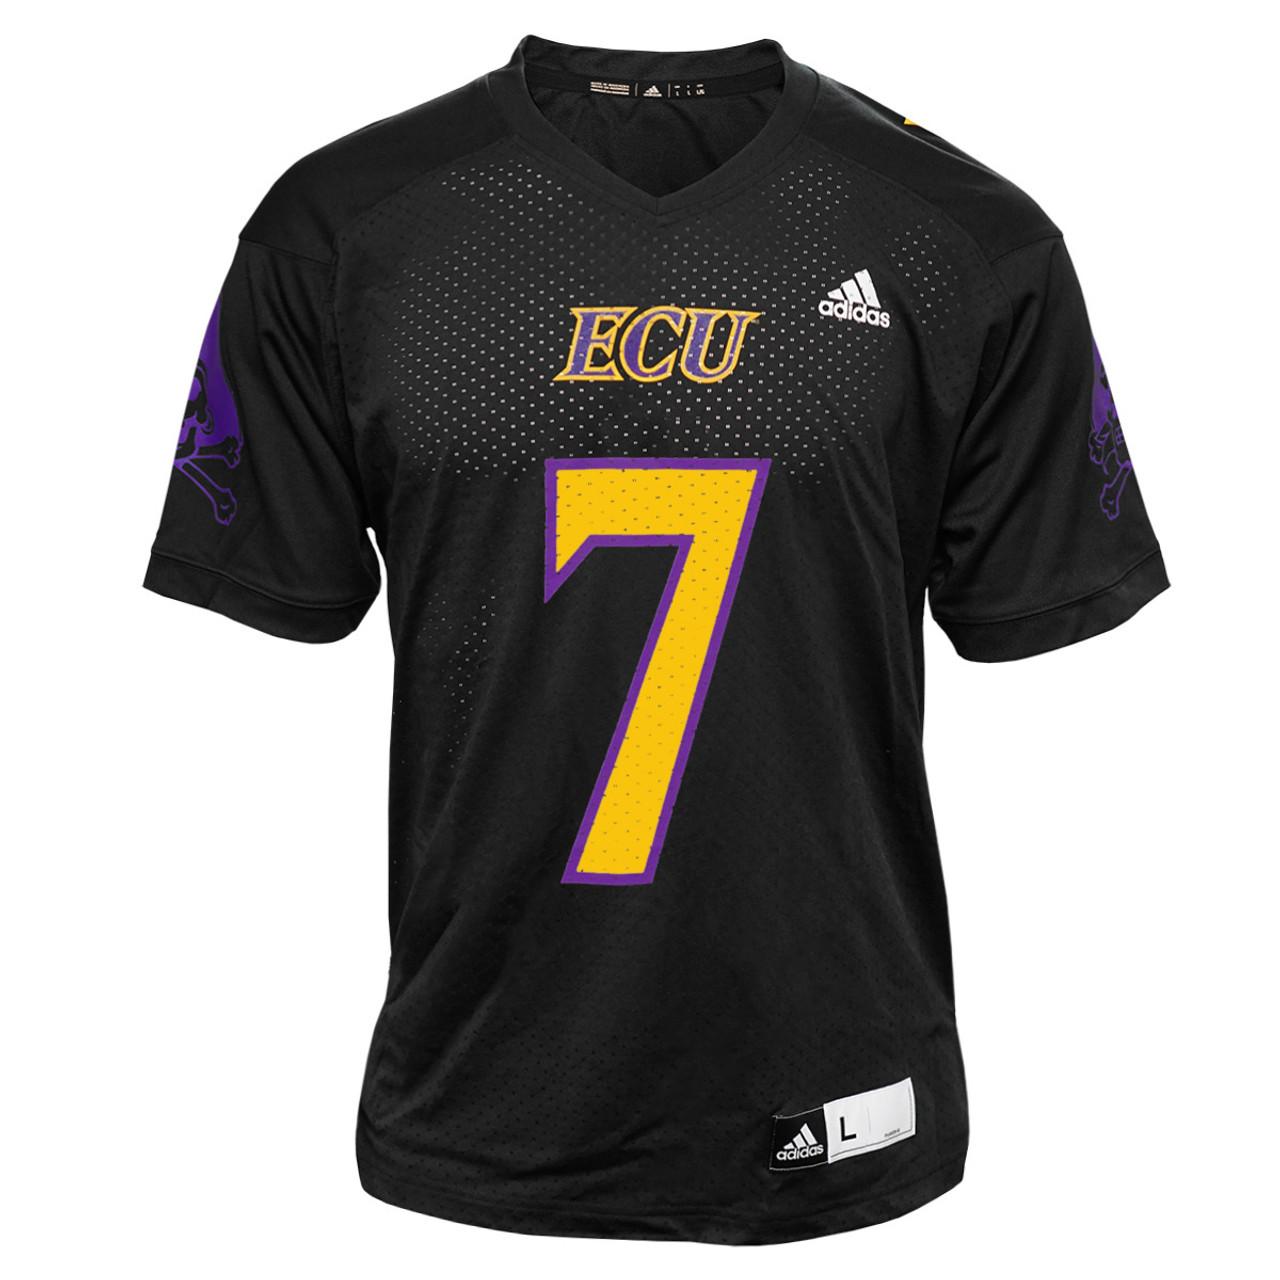 Replica No. 7 Black ECU Football Jersey